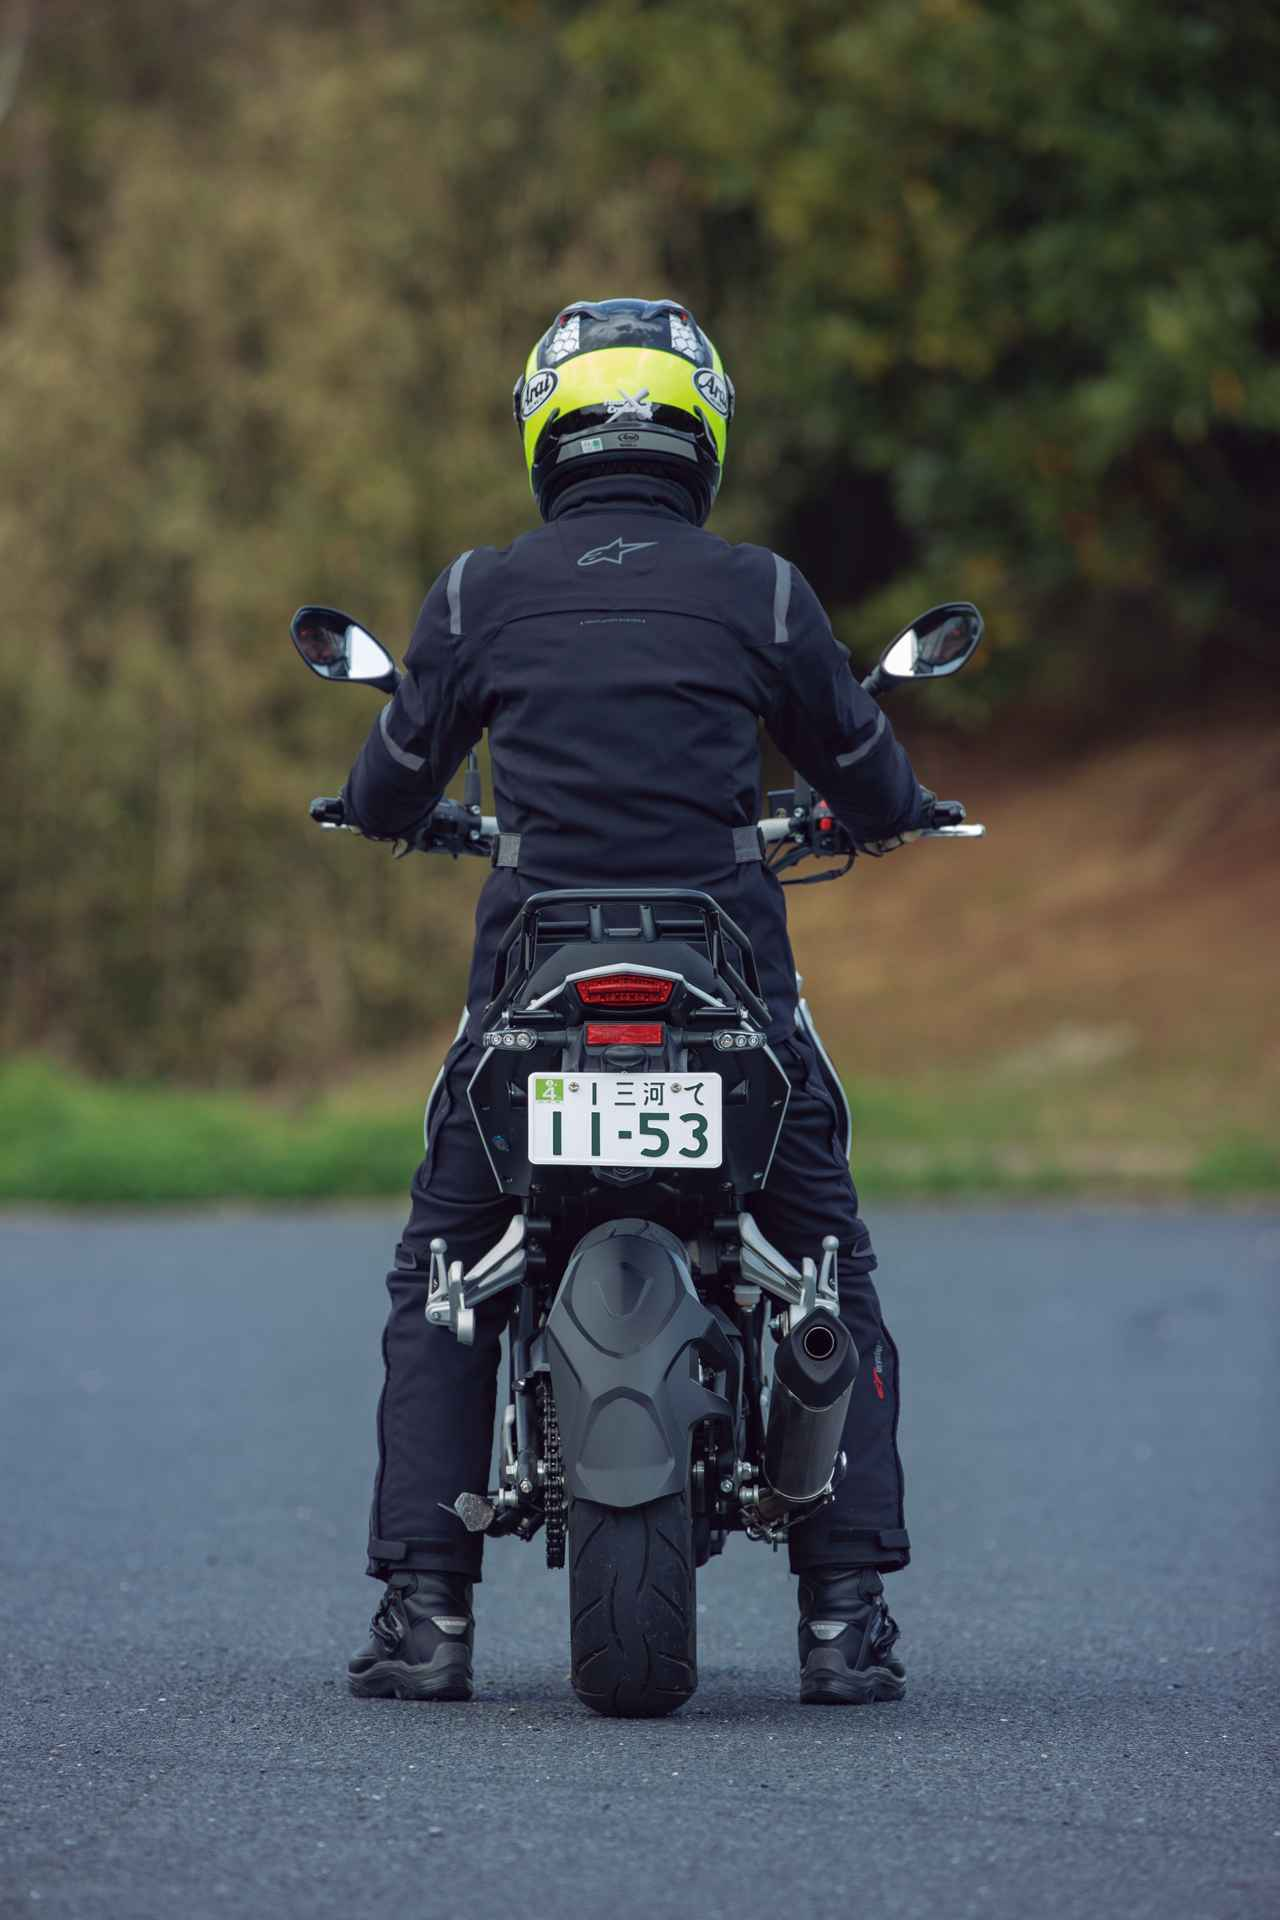 Images : 6番目の画像 - 【写真15枚】ベネリ「TRK251」 - webオートバイ